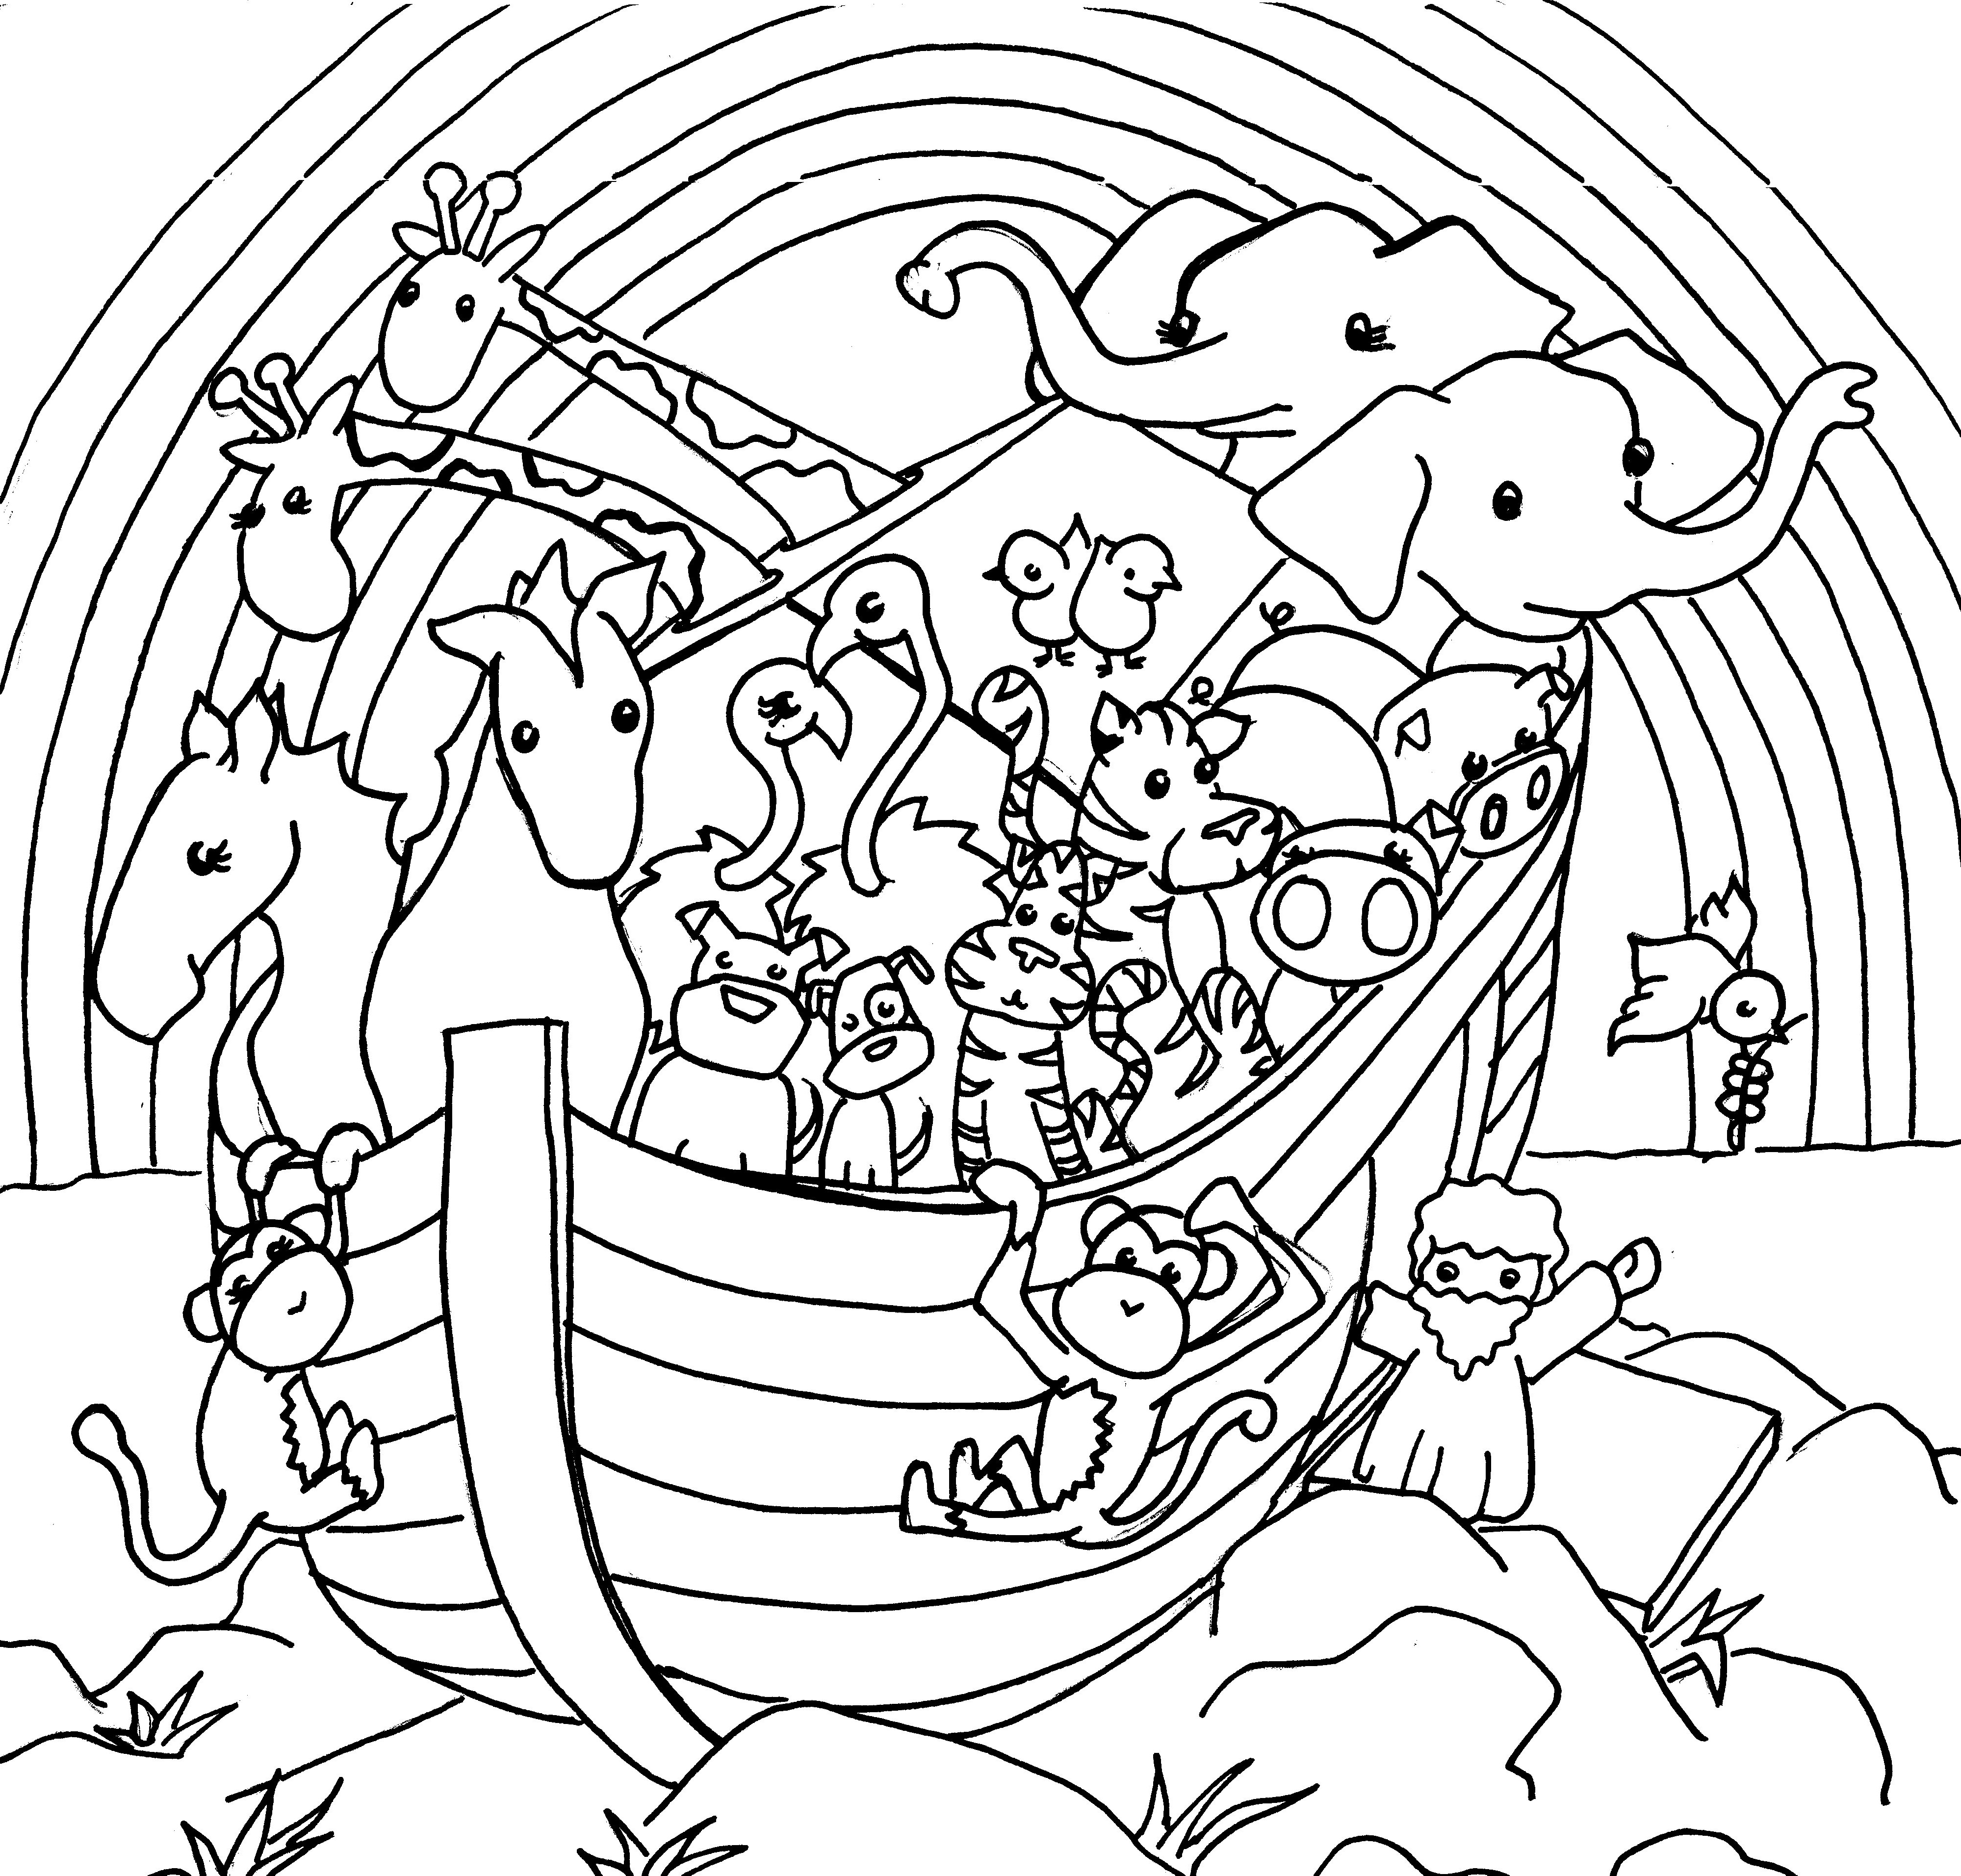 Children's coloring pages noah's ark - Coloring Pages Printable Noah S Ark 6